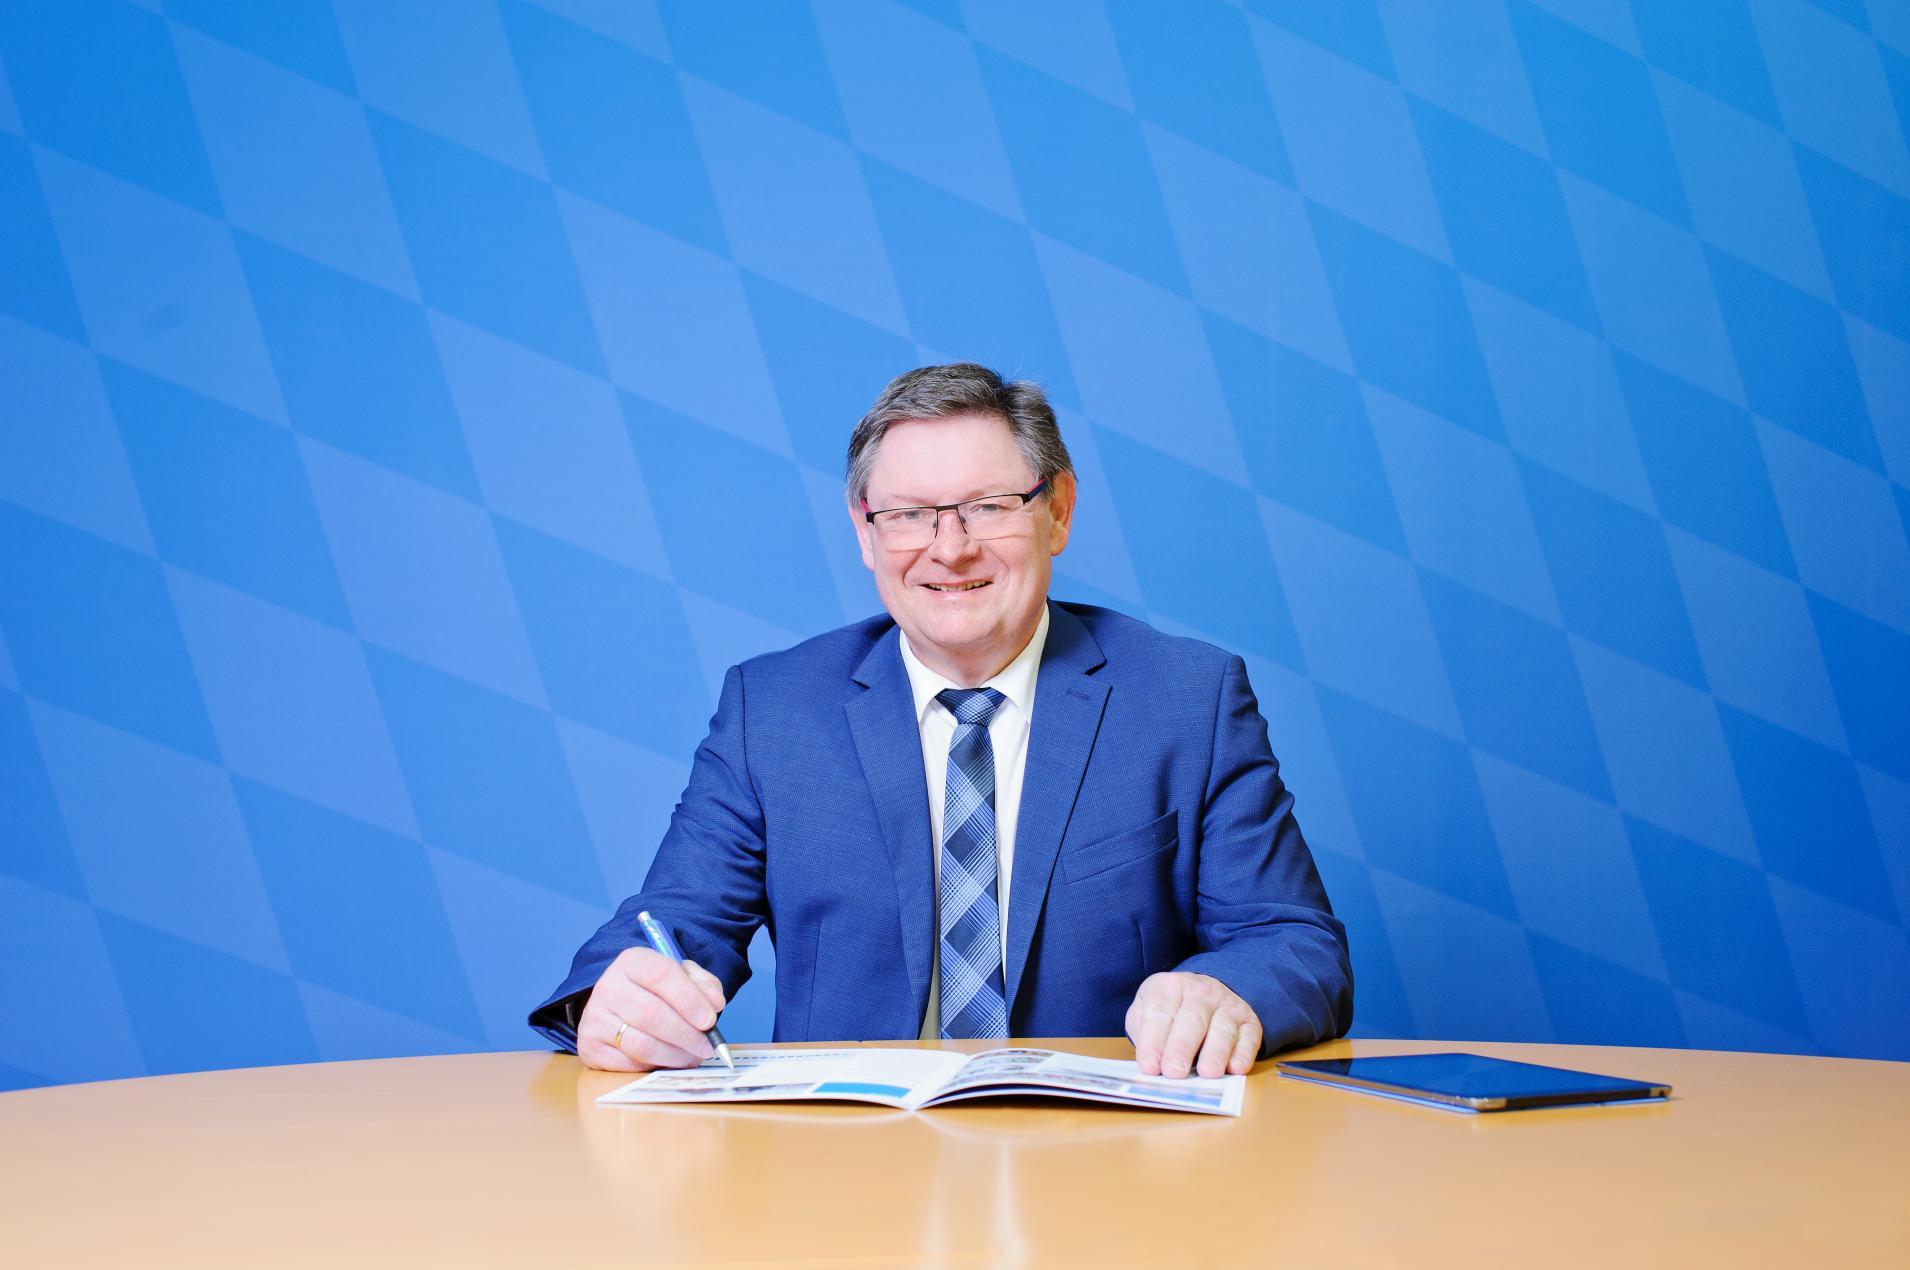 Foto: Photogenika GmbH München